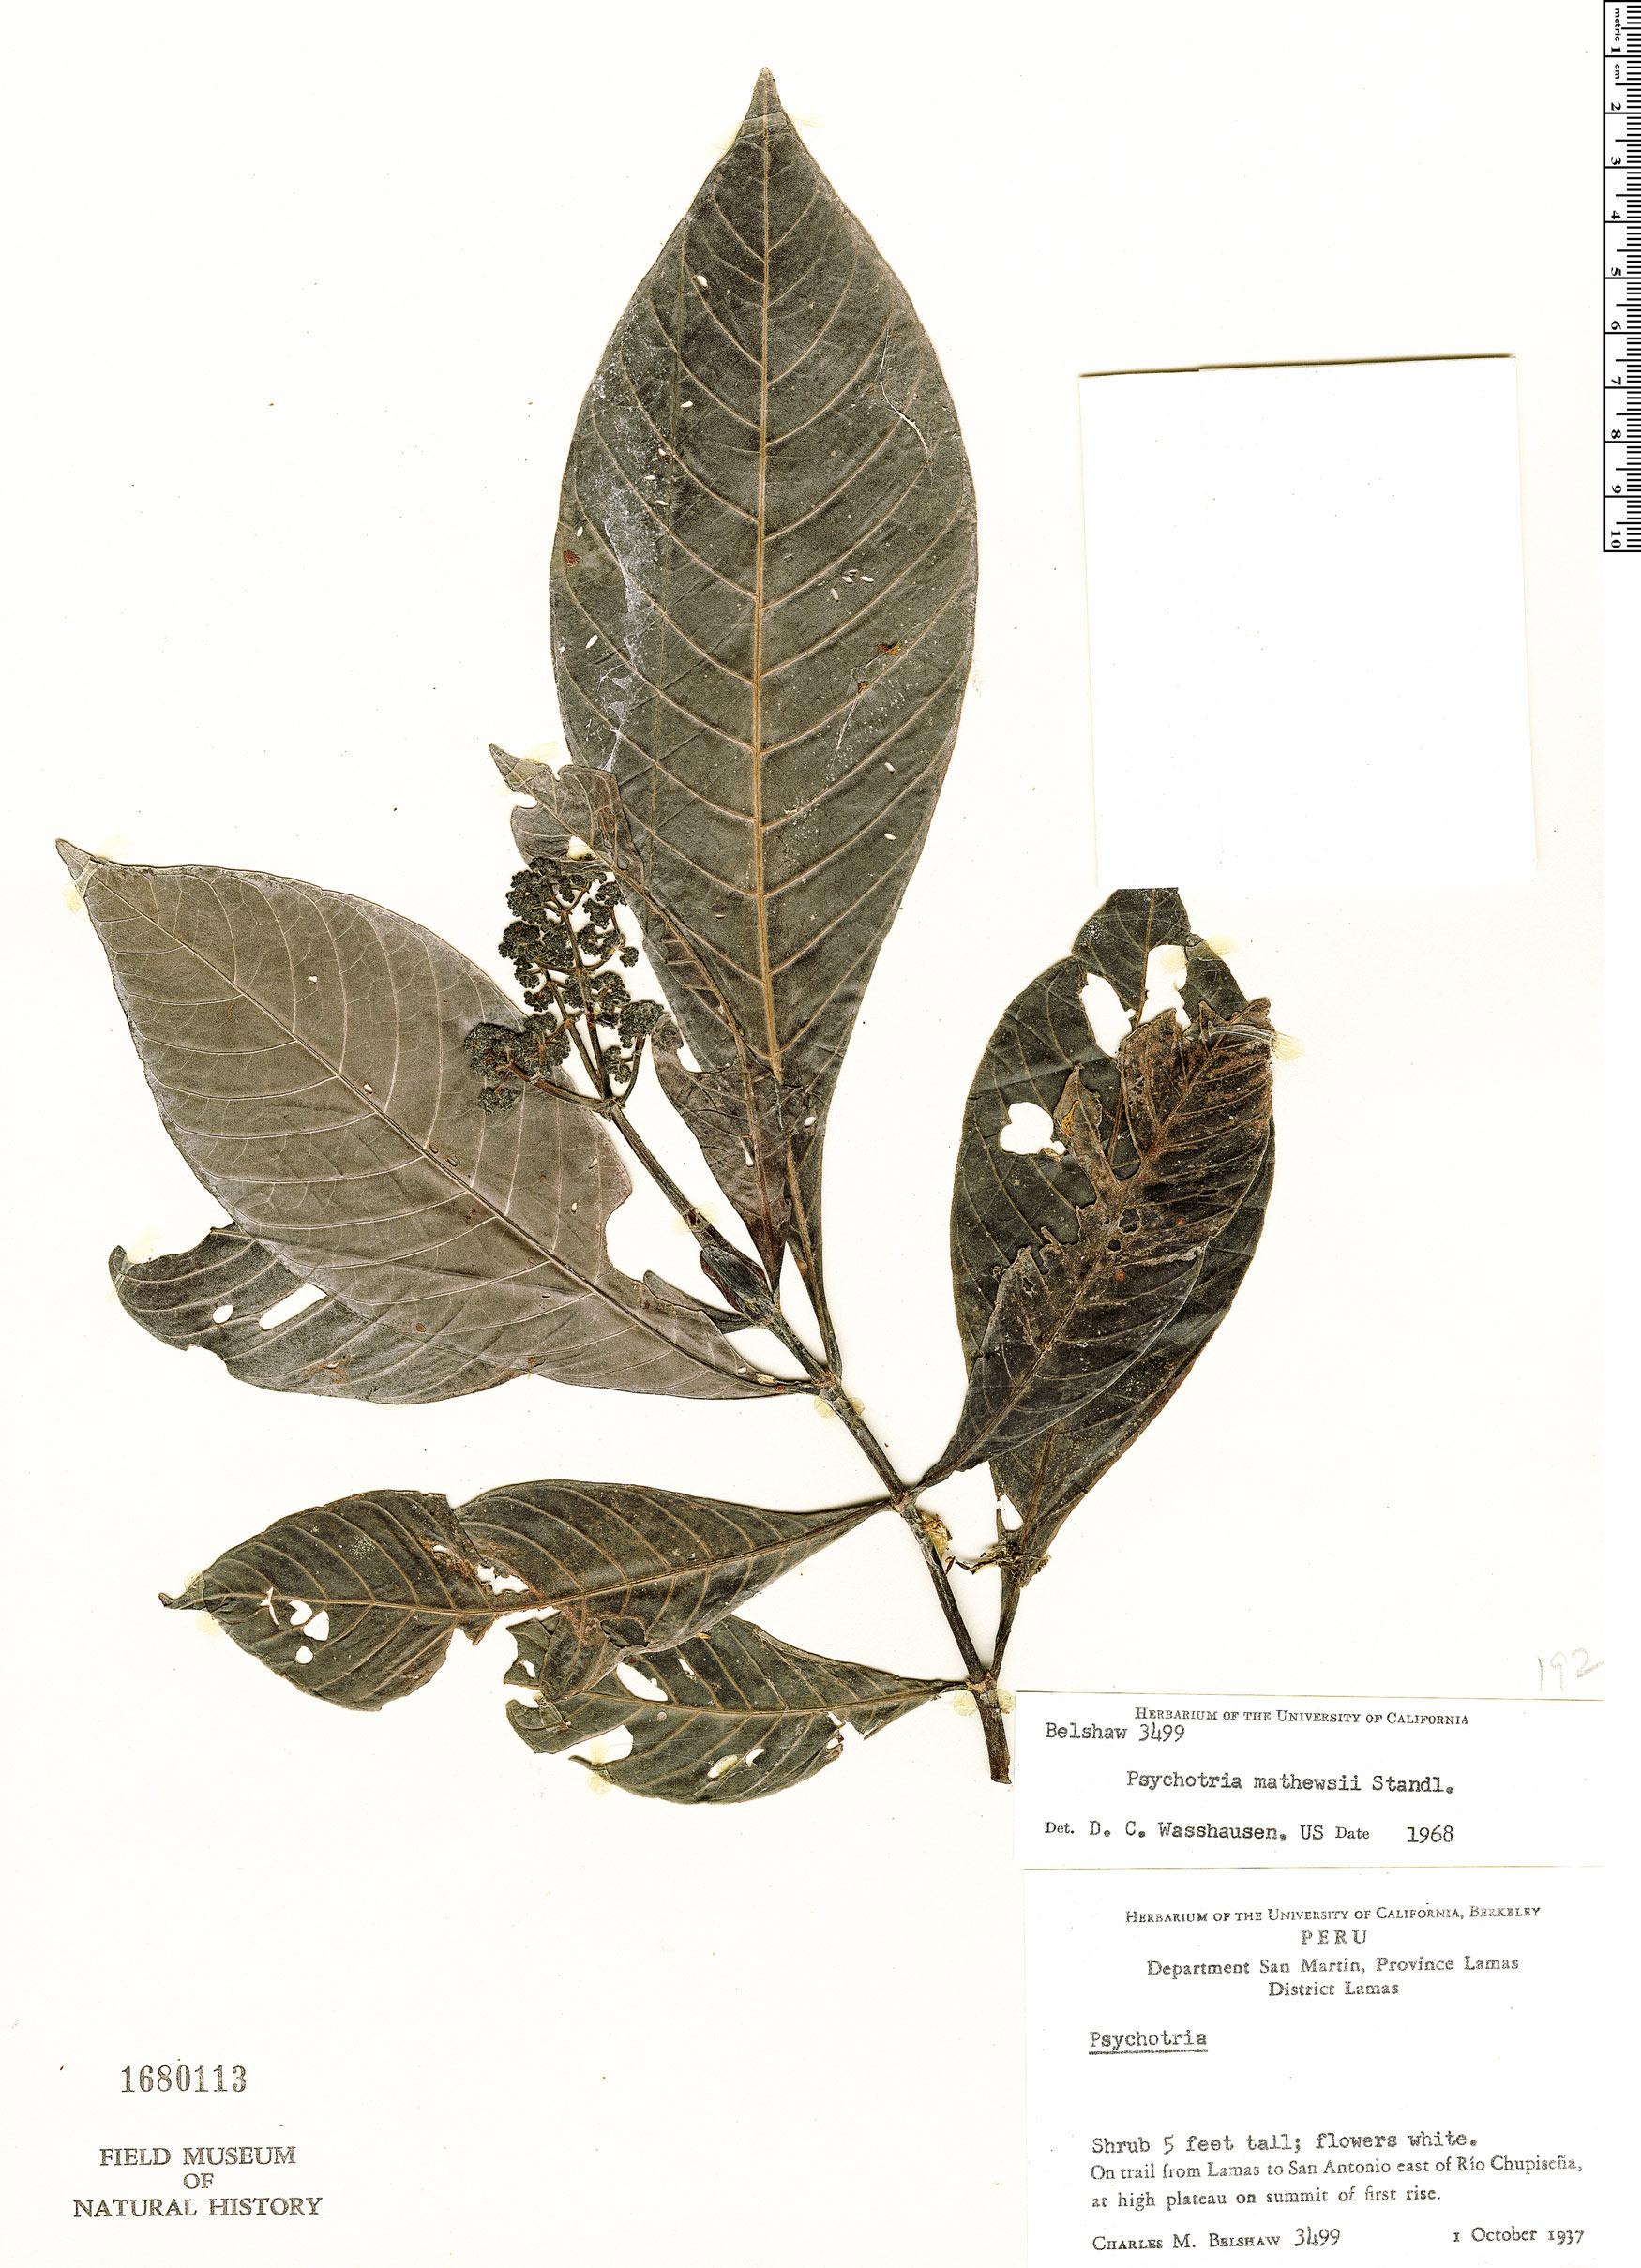 Specimen: Psychotria ernestii